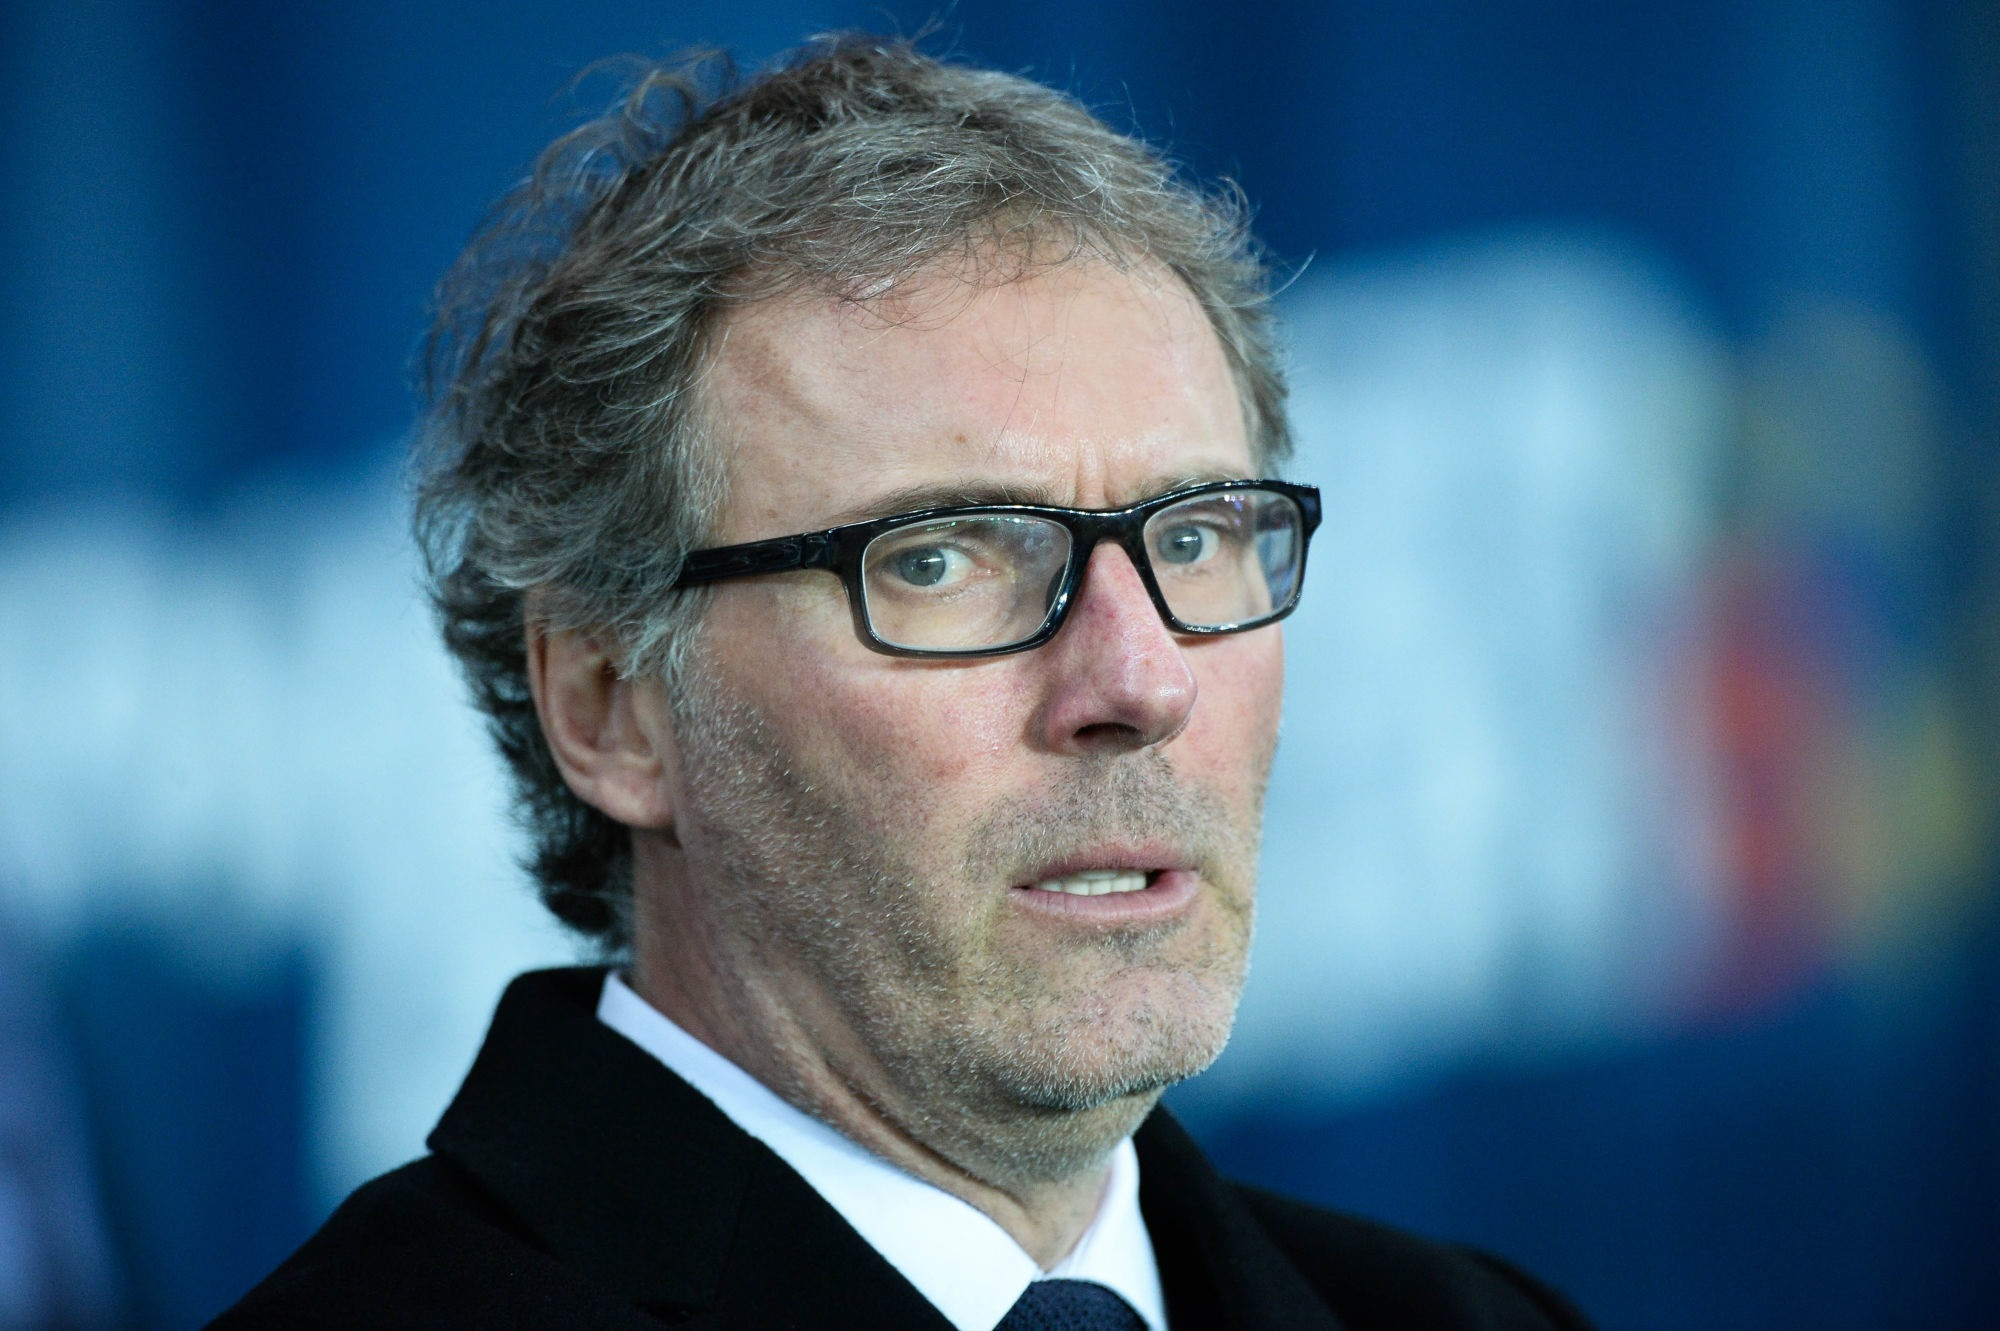 Anciens - Laurent Blanc vers Valence, Emery a des pistes selon L'Equipe